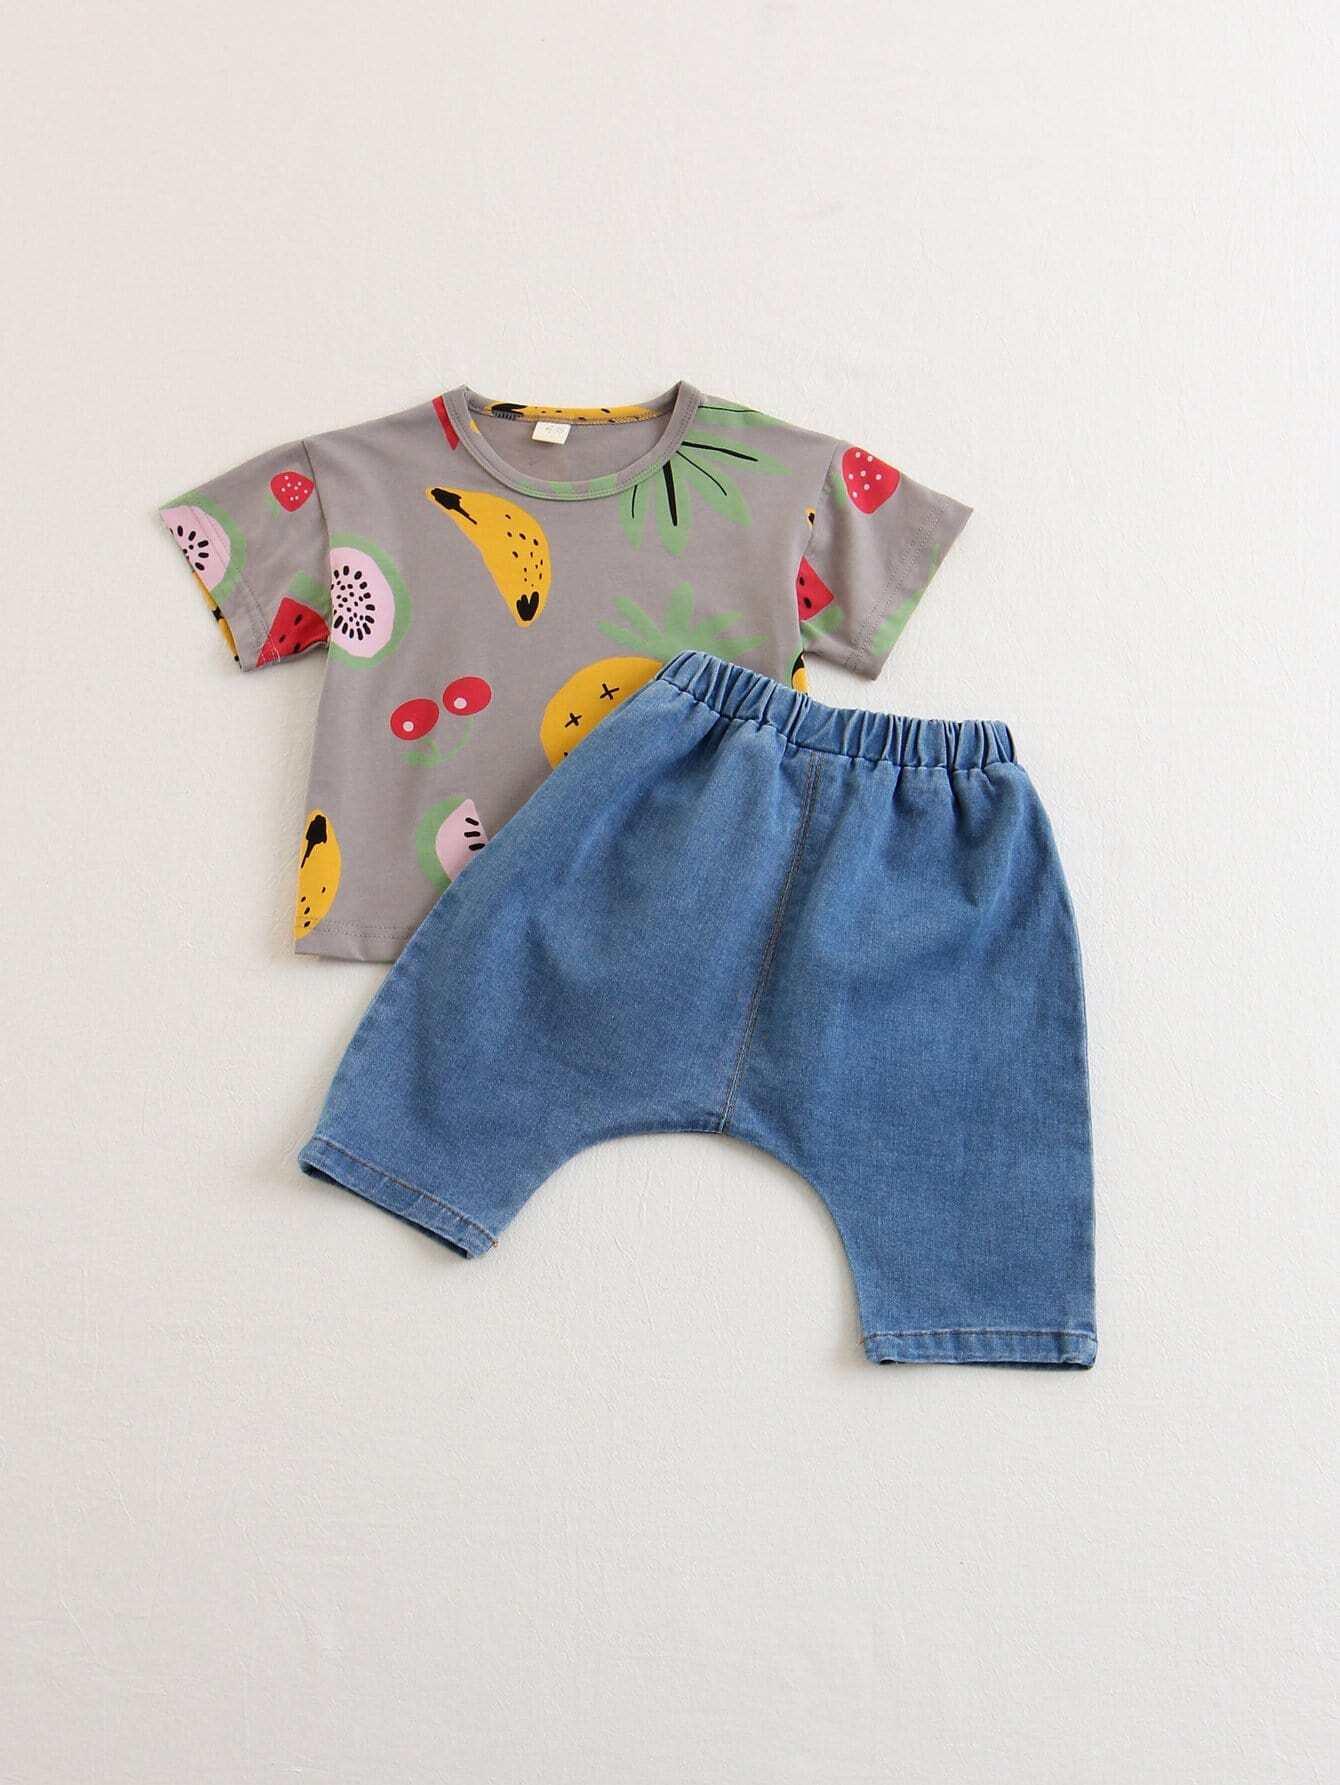 Kids Fruit Print Tee With Pants heimatlob